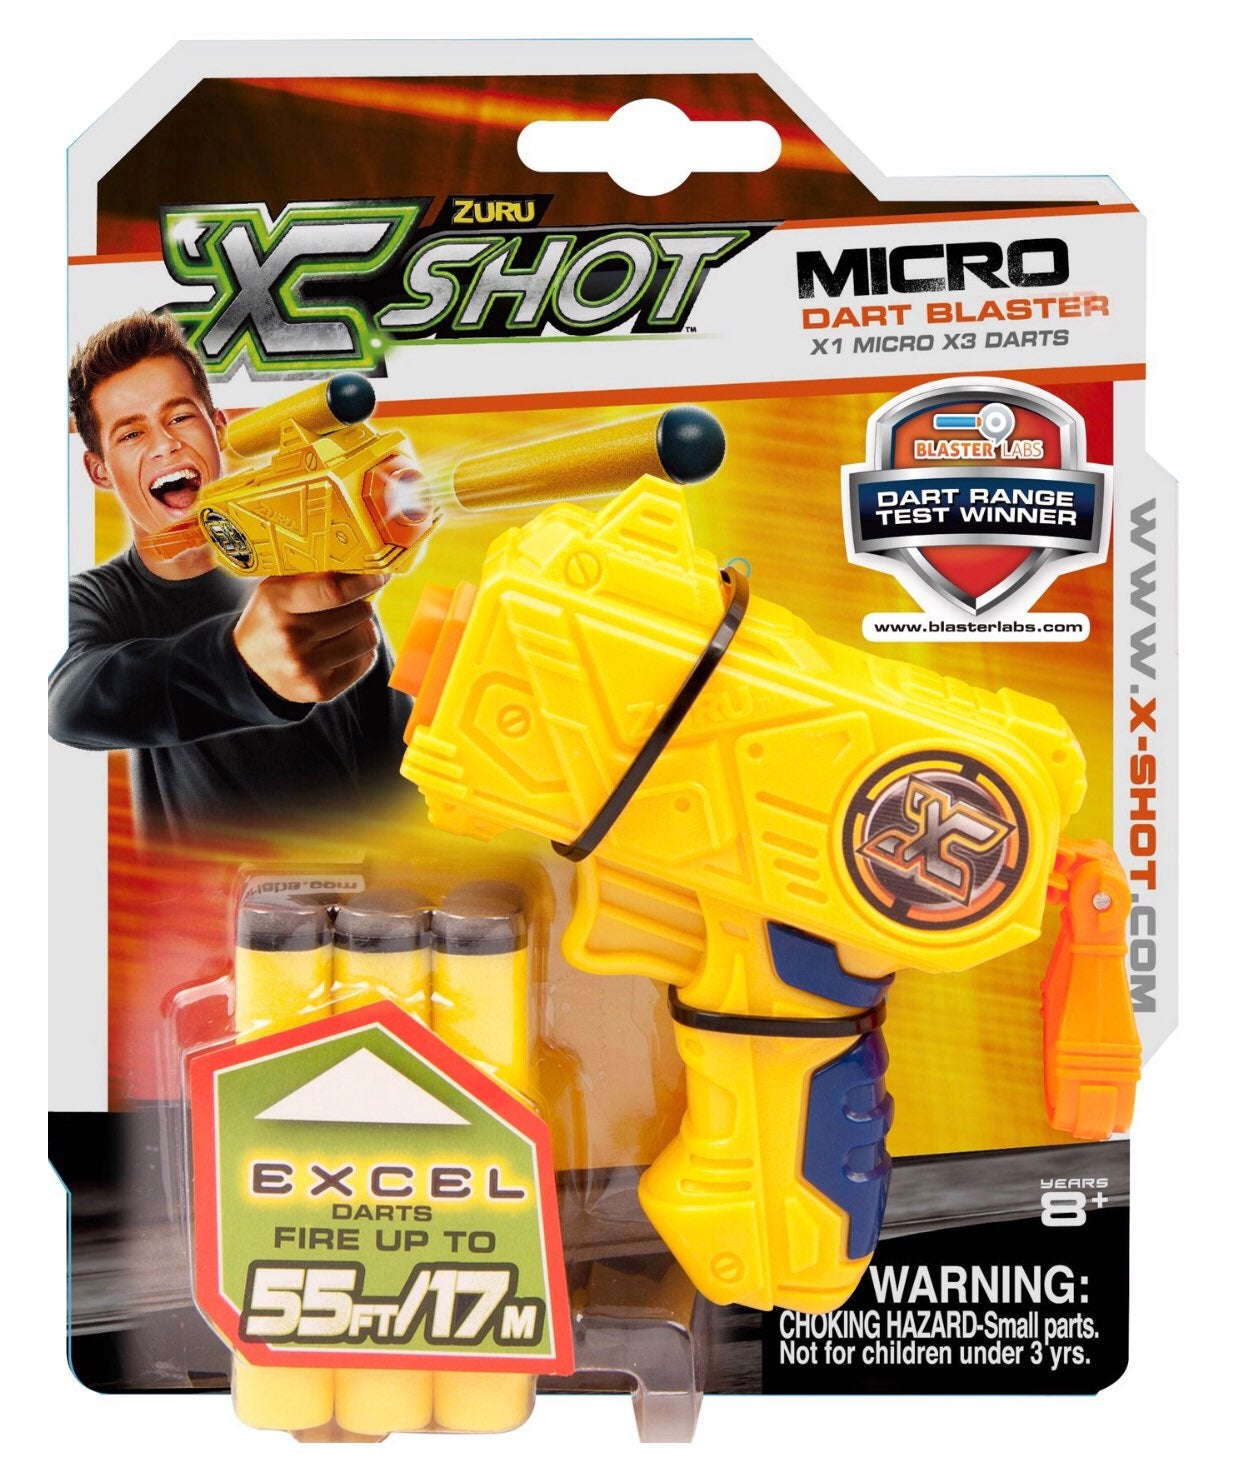 "NEW Zuru X SHOT Micro Dart Blaster 3.5"""